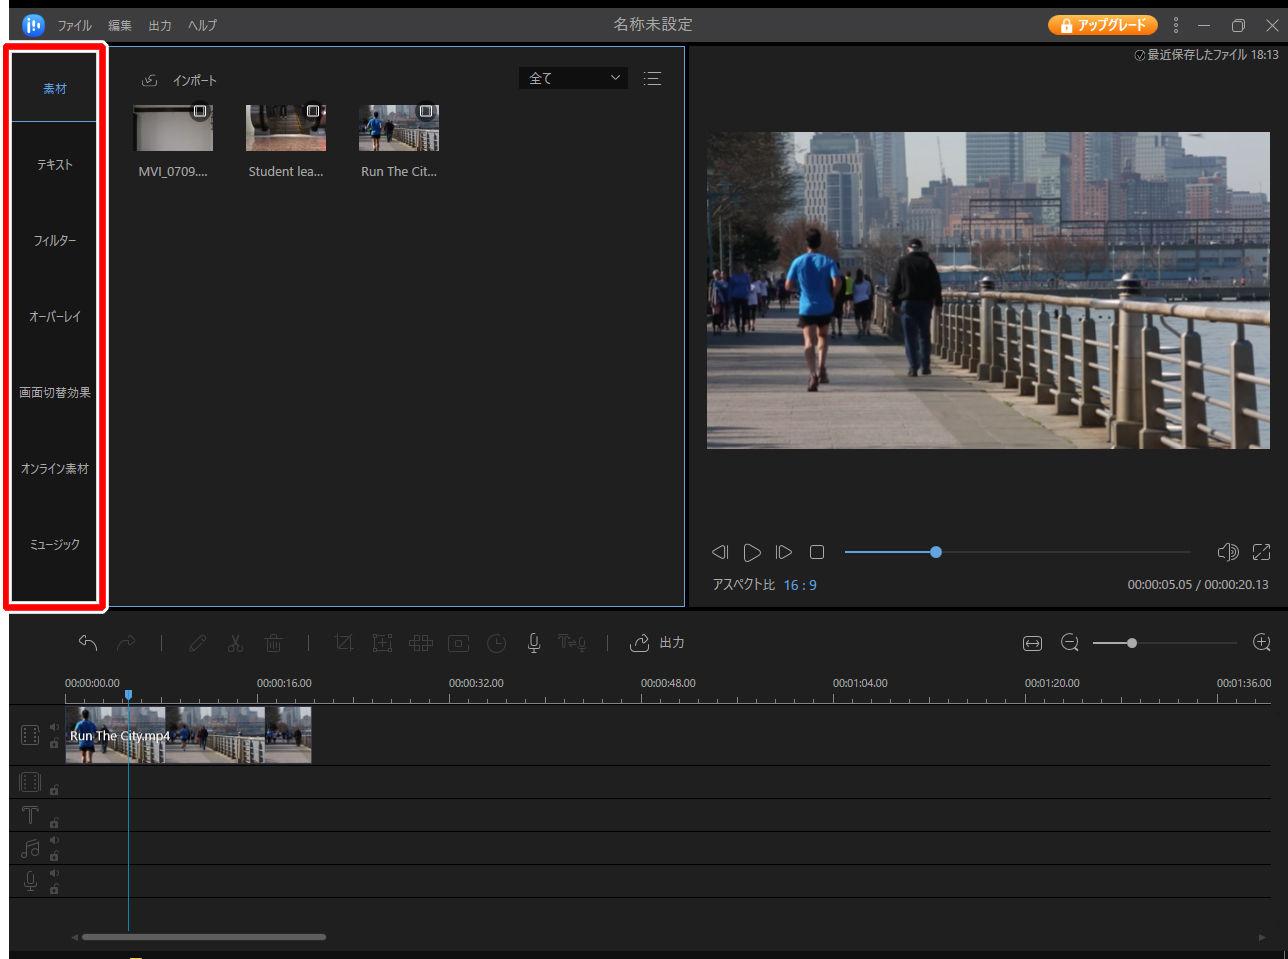 EaseUS Video Editorの各項目について